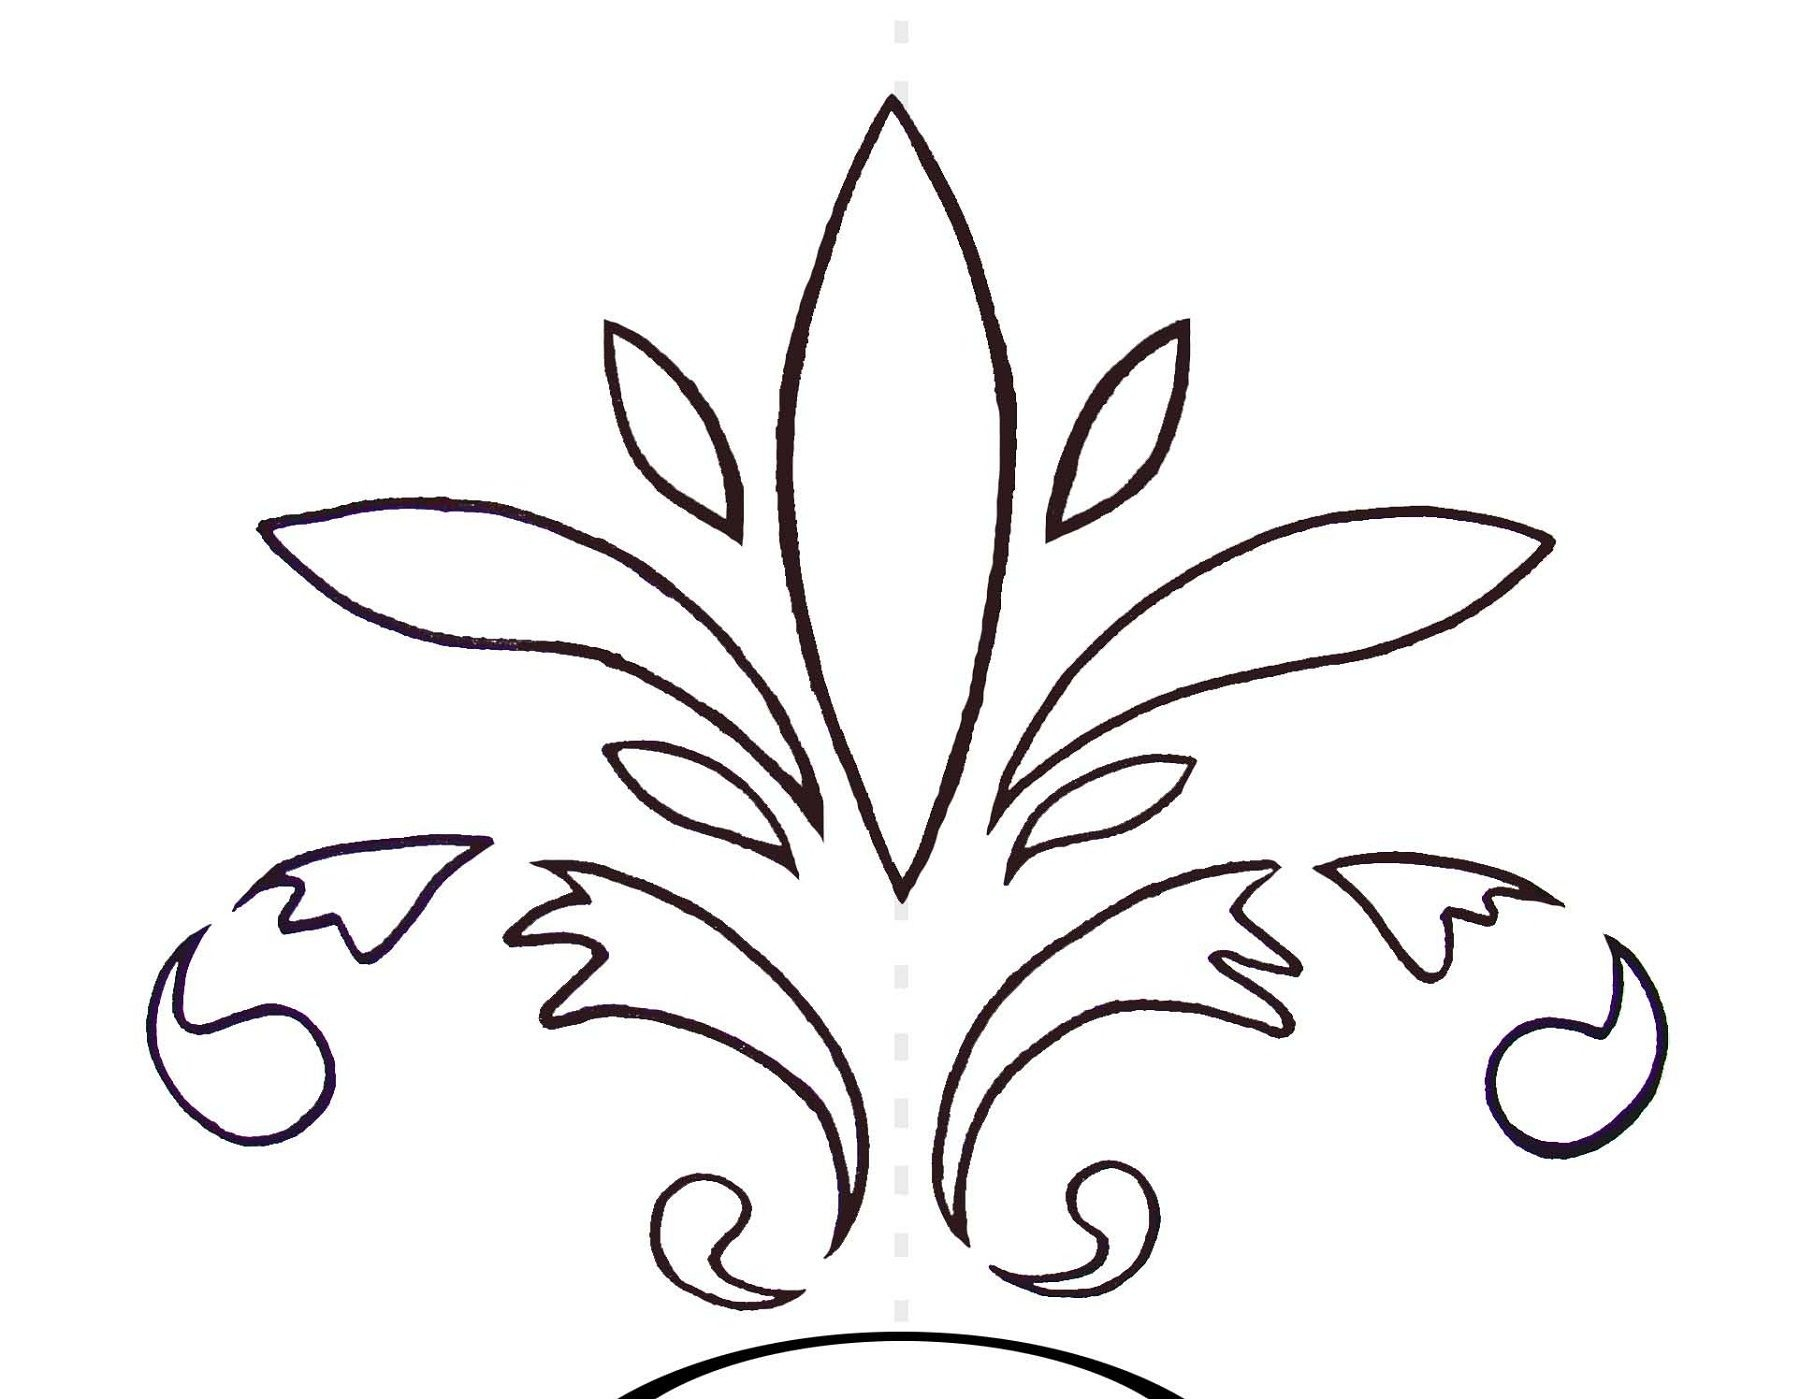 Printable Stencils With Simple Design | Stencils Printable - Damask Stencil Printable Free